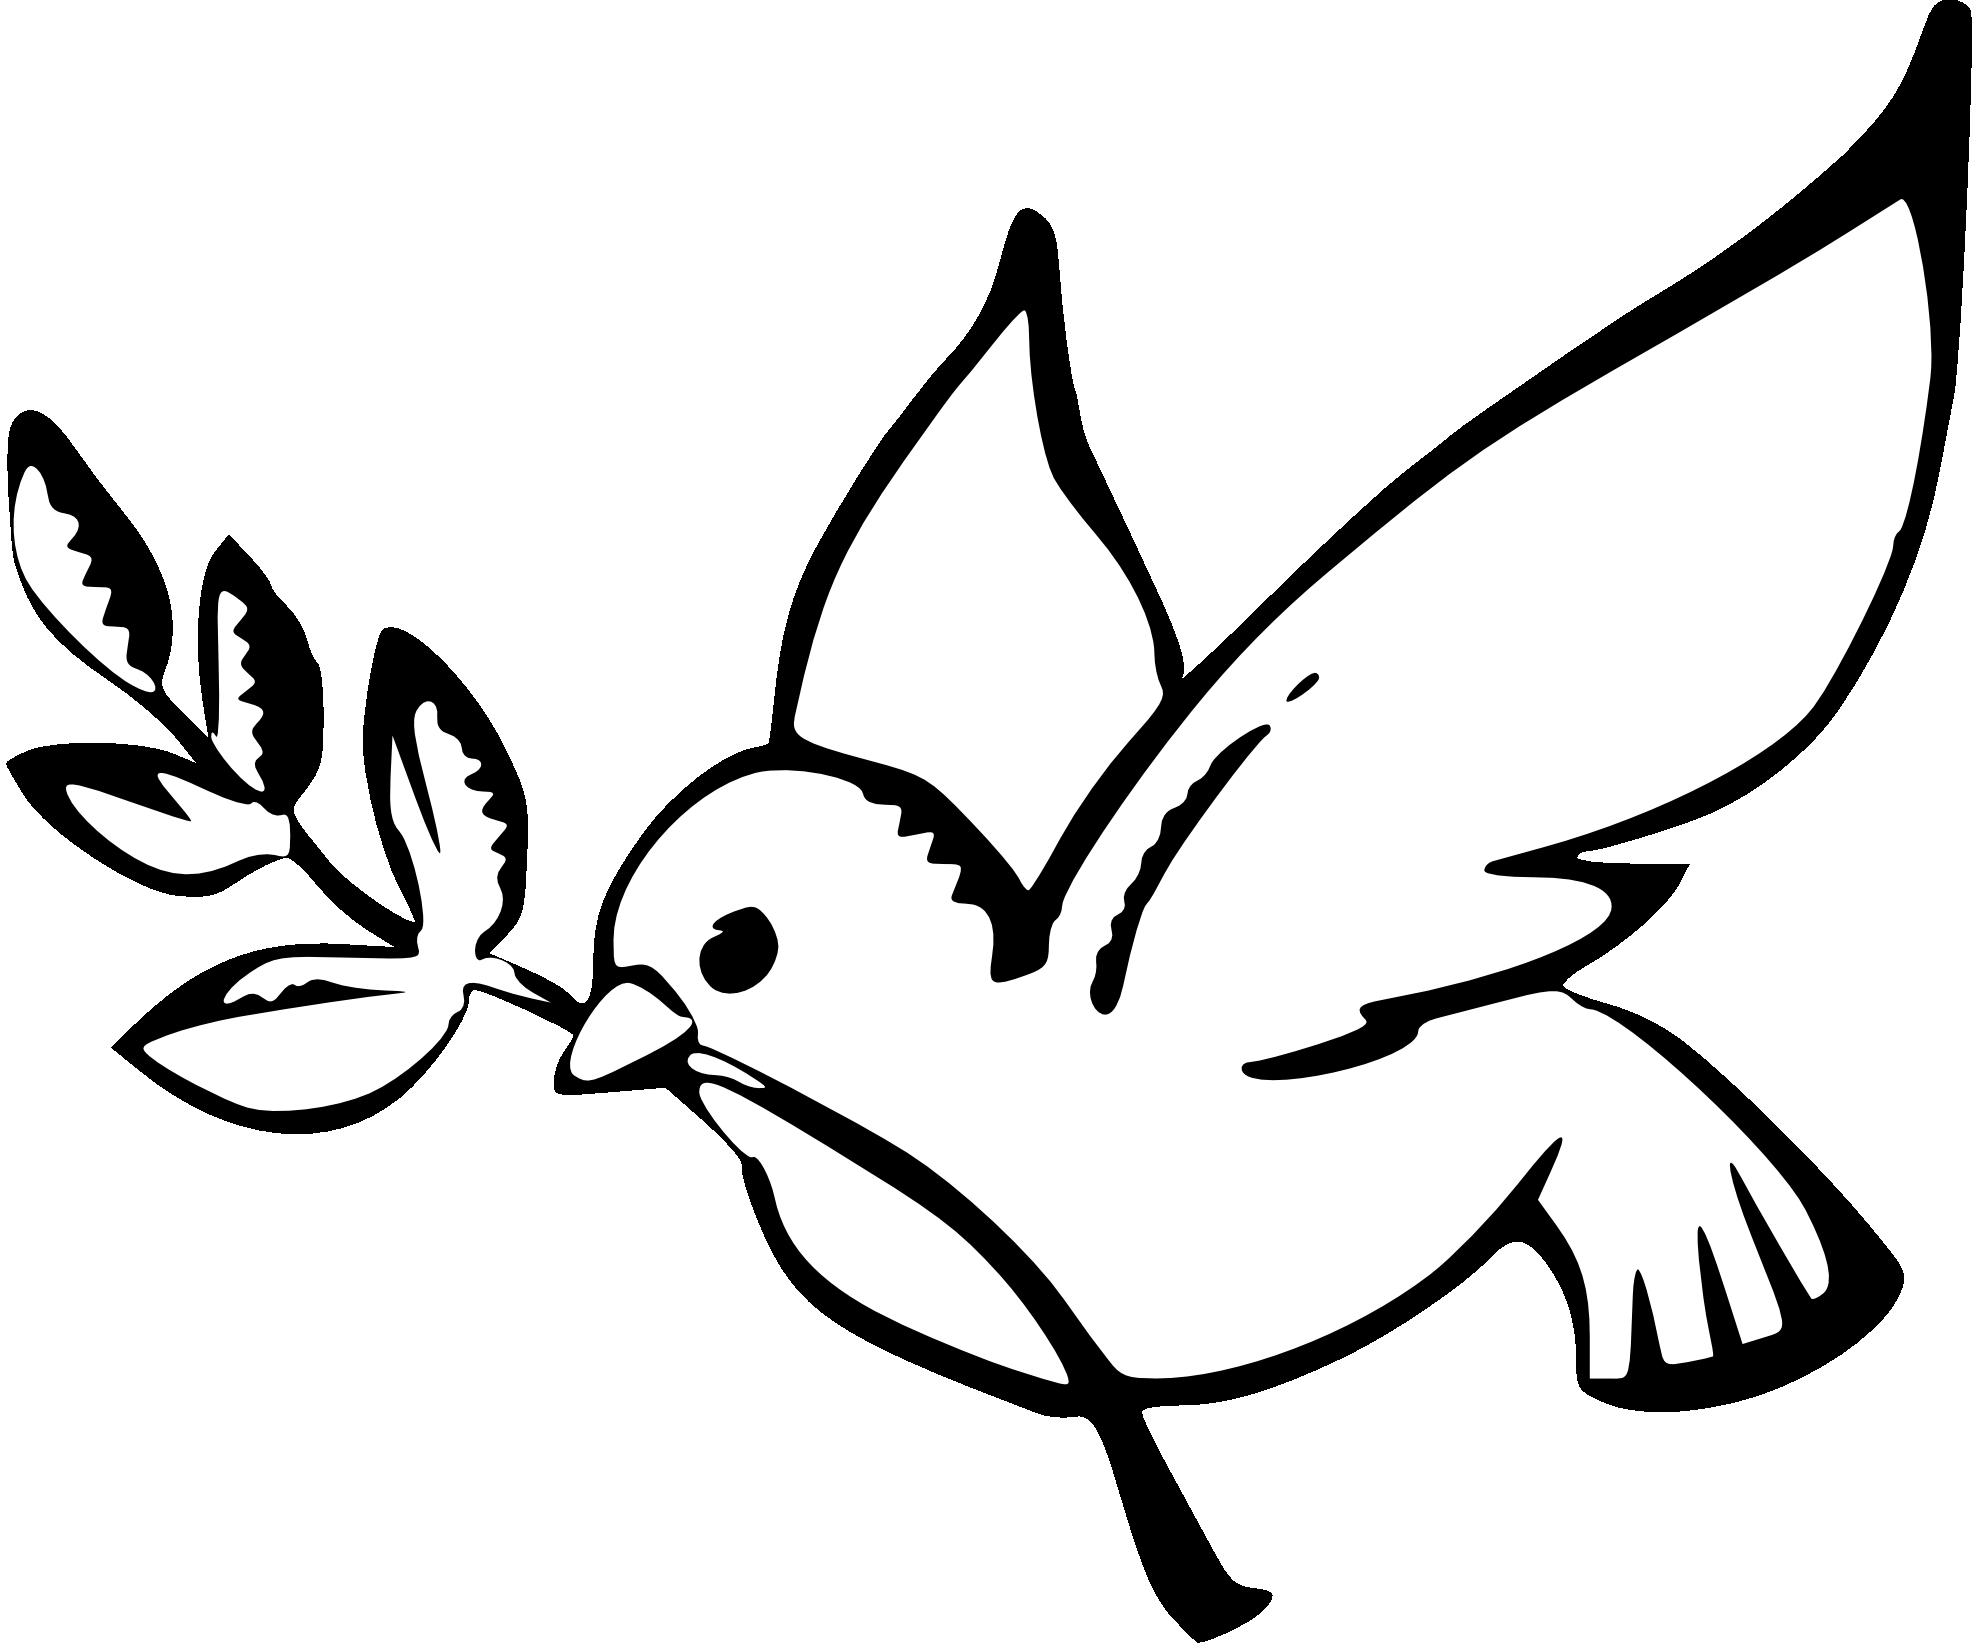 Drawn peace sign wing Black line dove art art